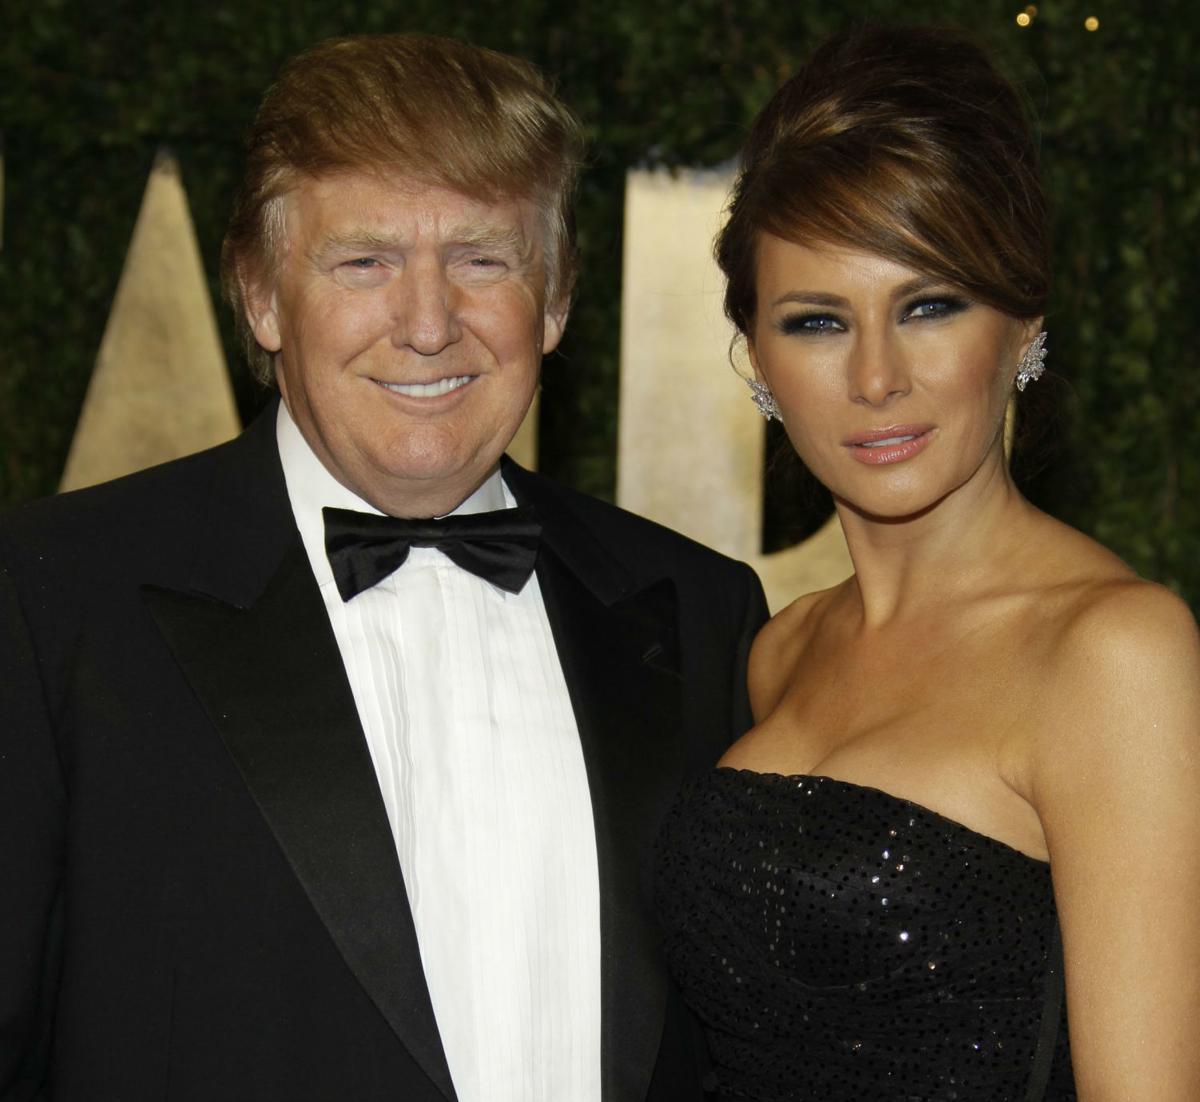 Donald Trump And Melania Wedding: Trump Wedding Cake, Made By Lancaster Chef Cedric Barberet